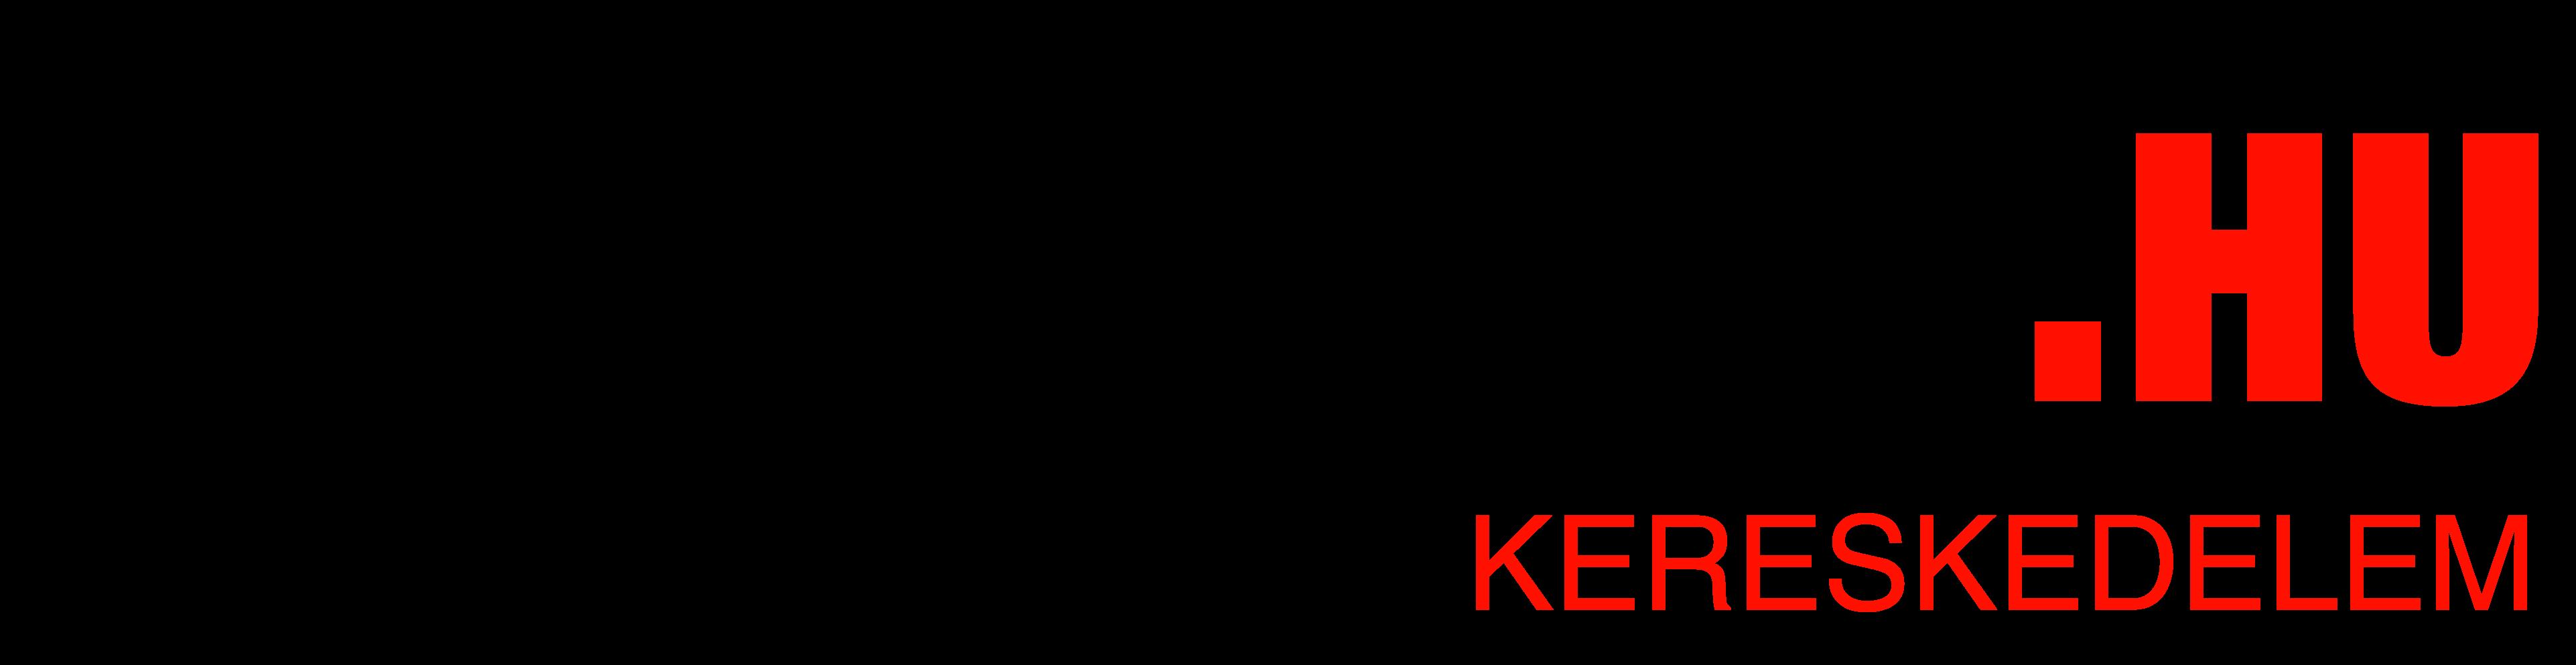 Megakran--09